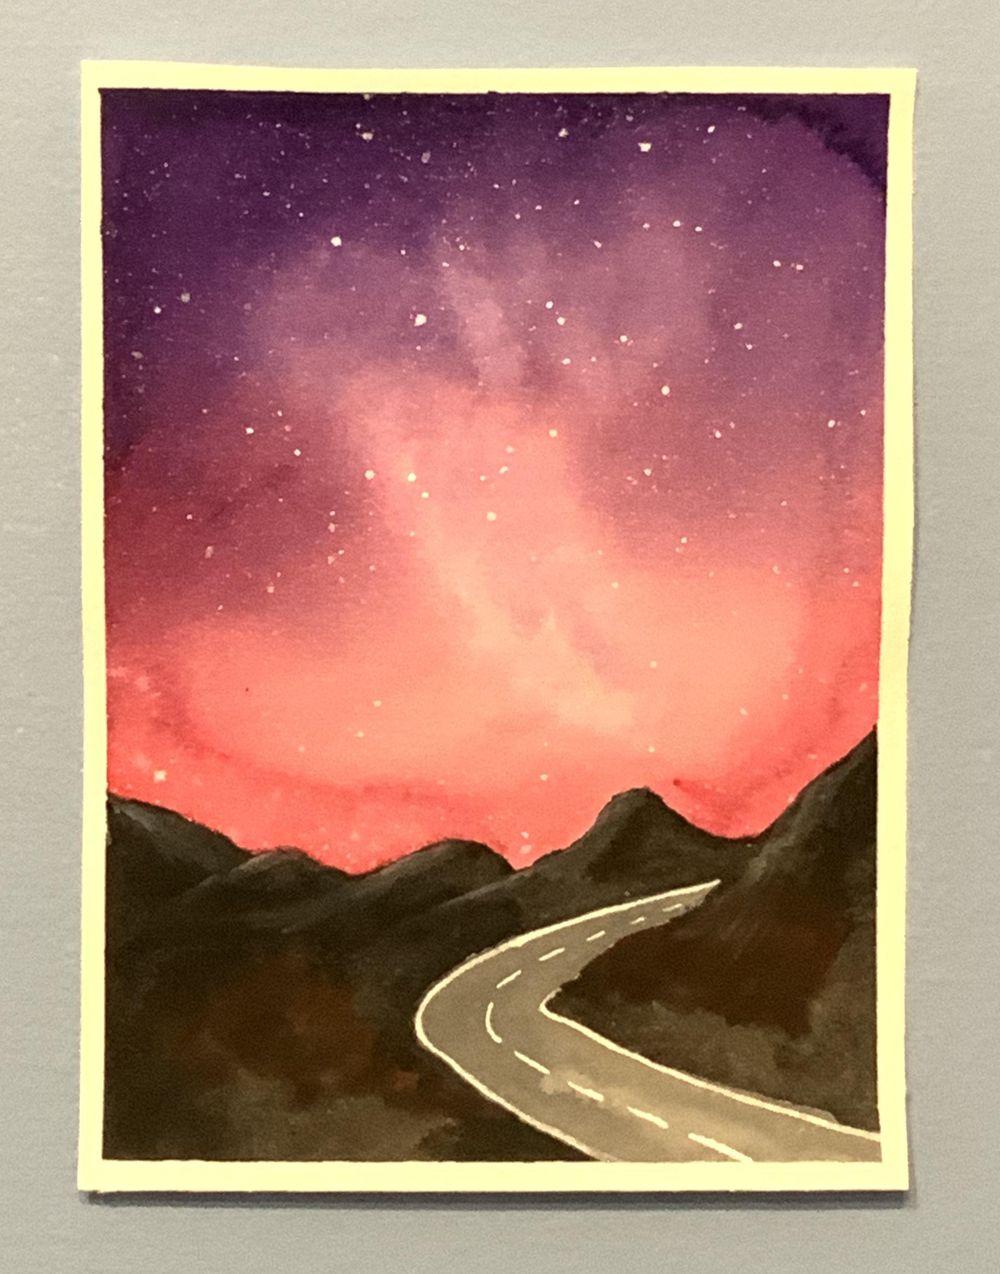 5 beautiful night skies - image 3 - student project